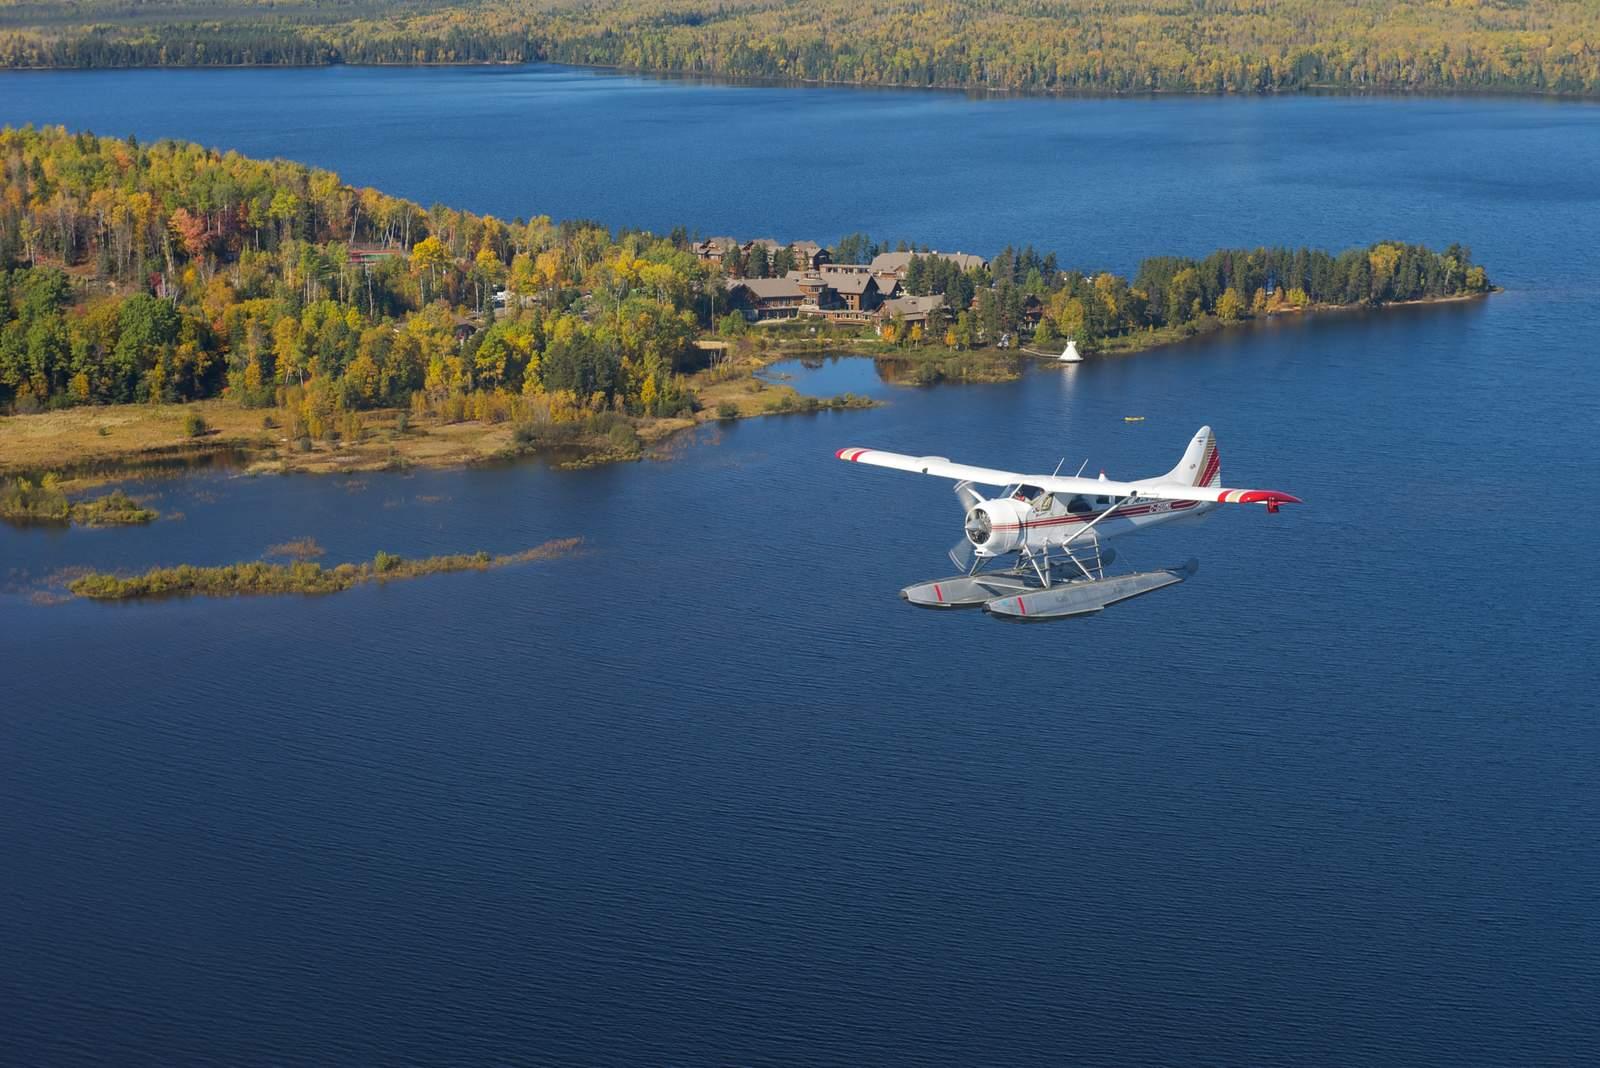 Wasserflugzeugflug